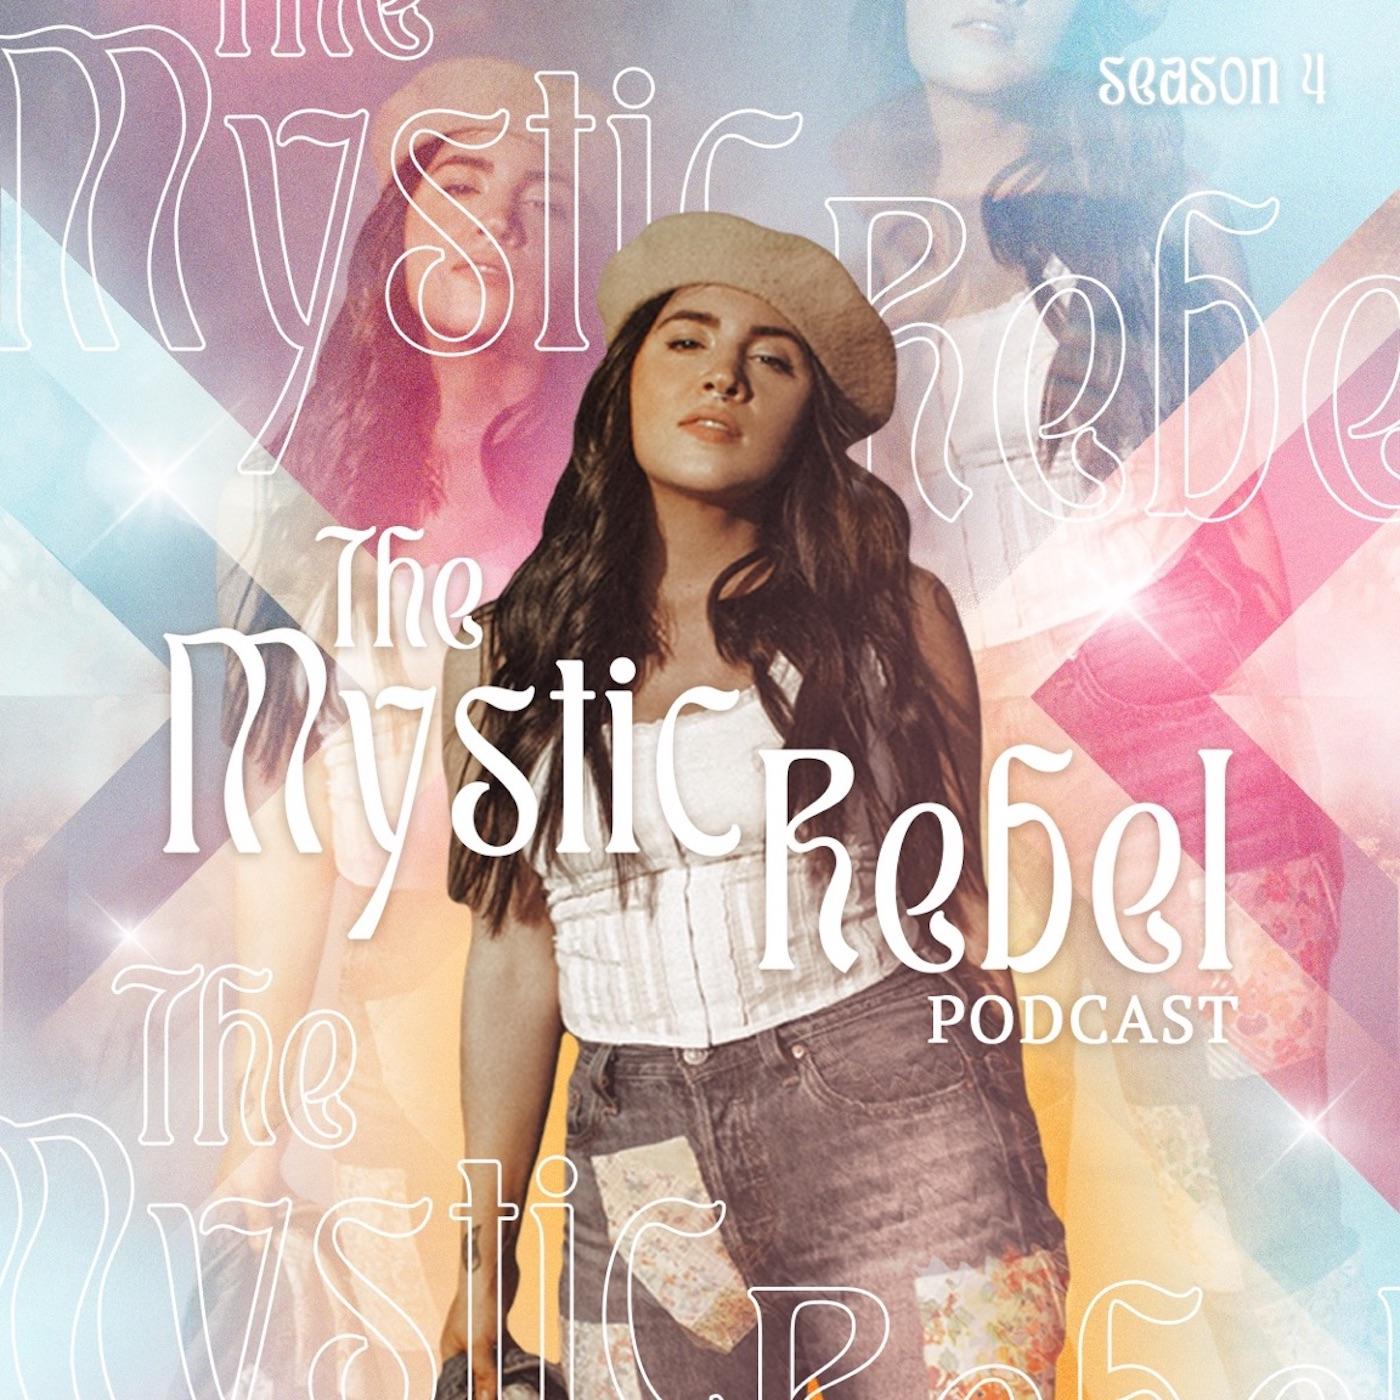 The Mystic Rebel Podcast show art